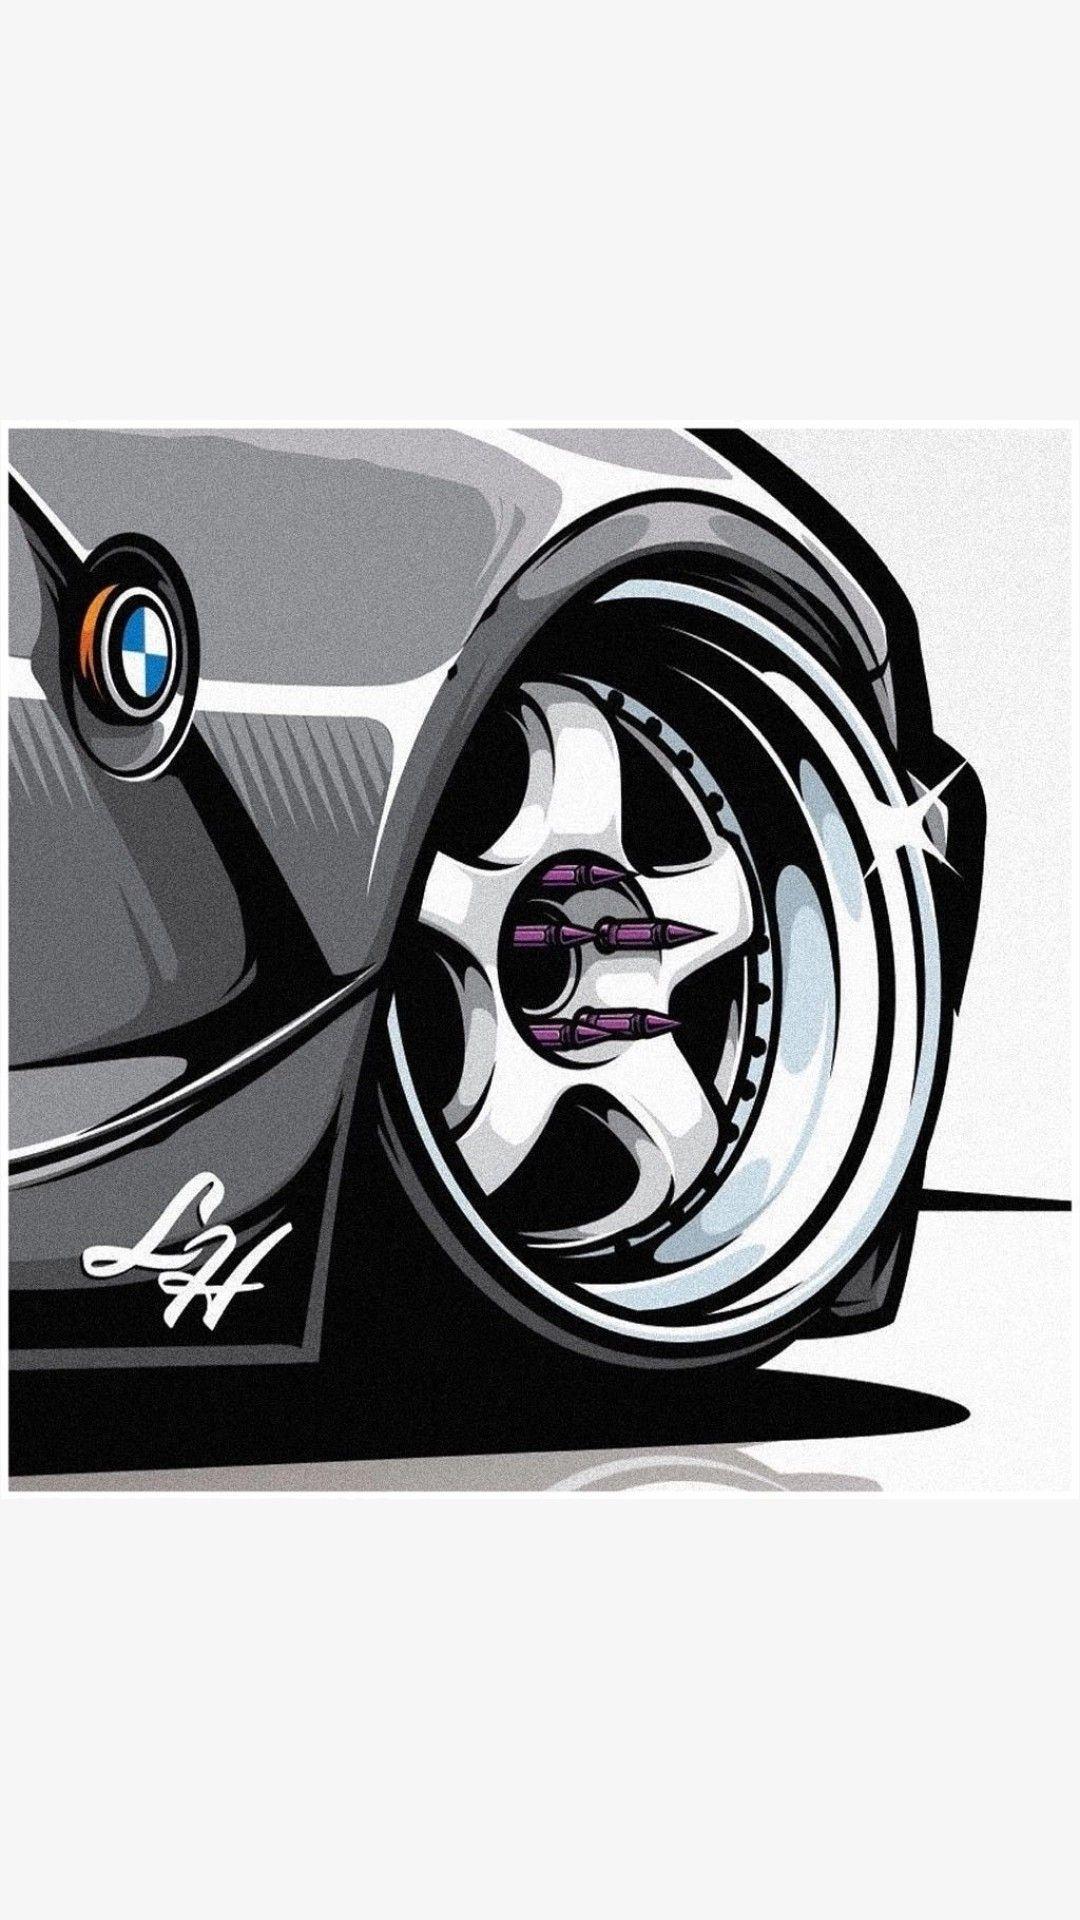 Pin Oleh Ich Bin Zeus Di Arabalar Cars Gambar Animasi Mobil Balap